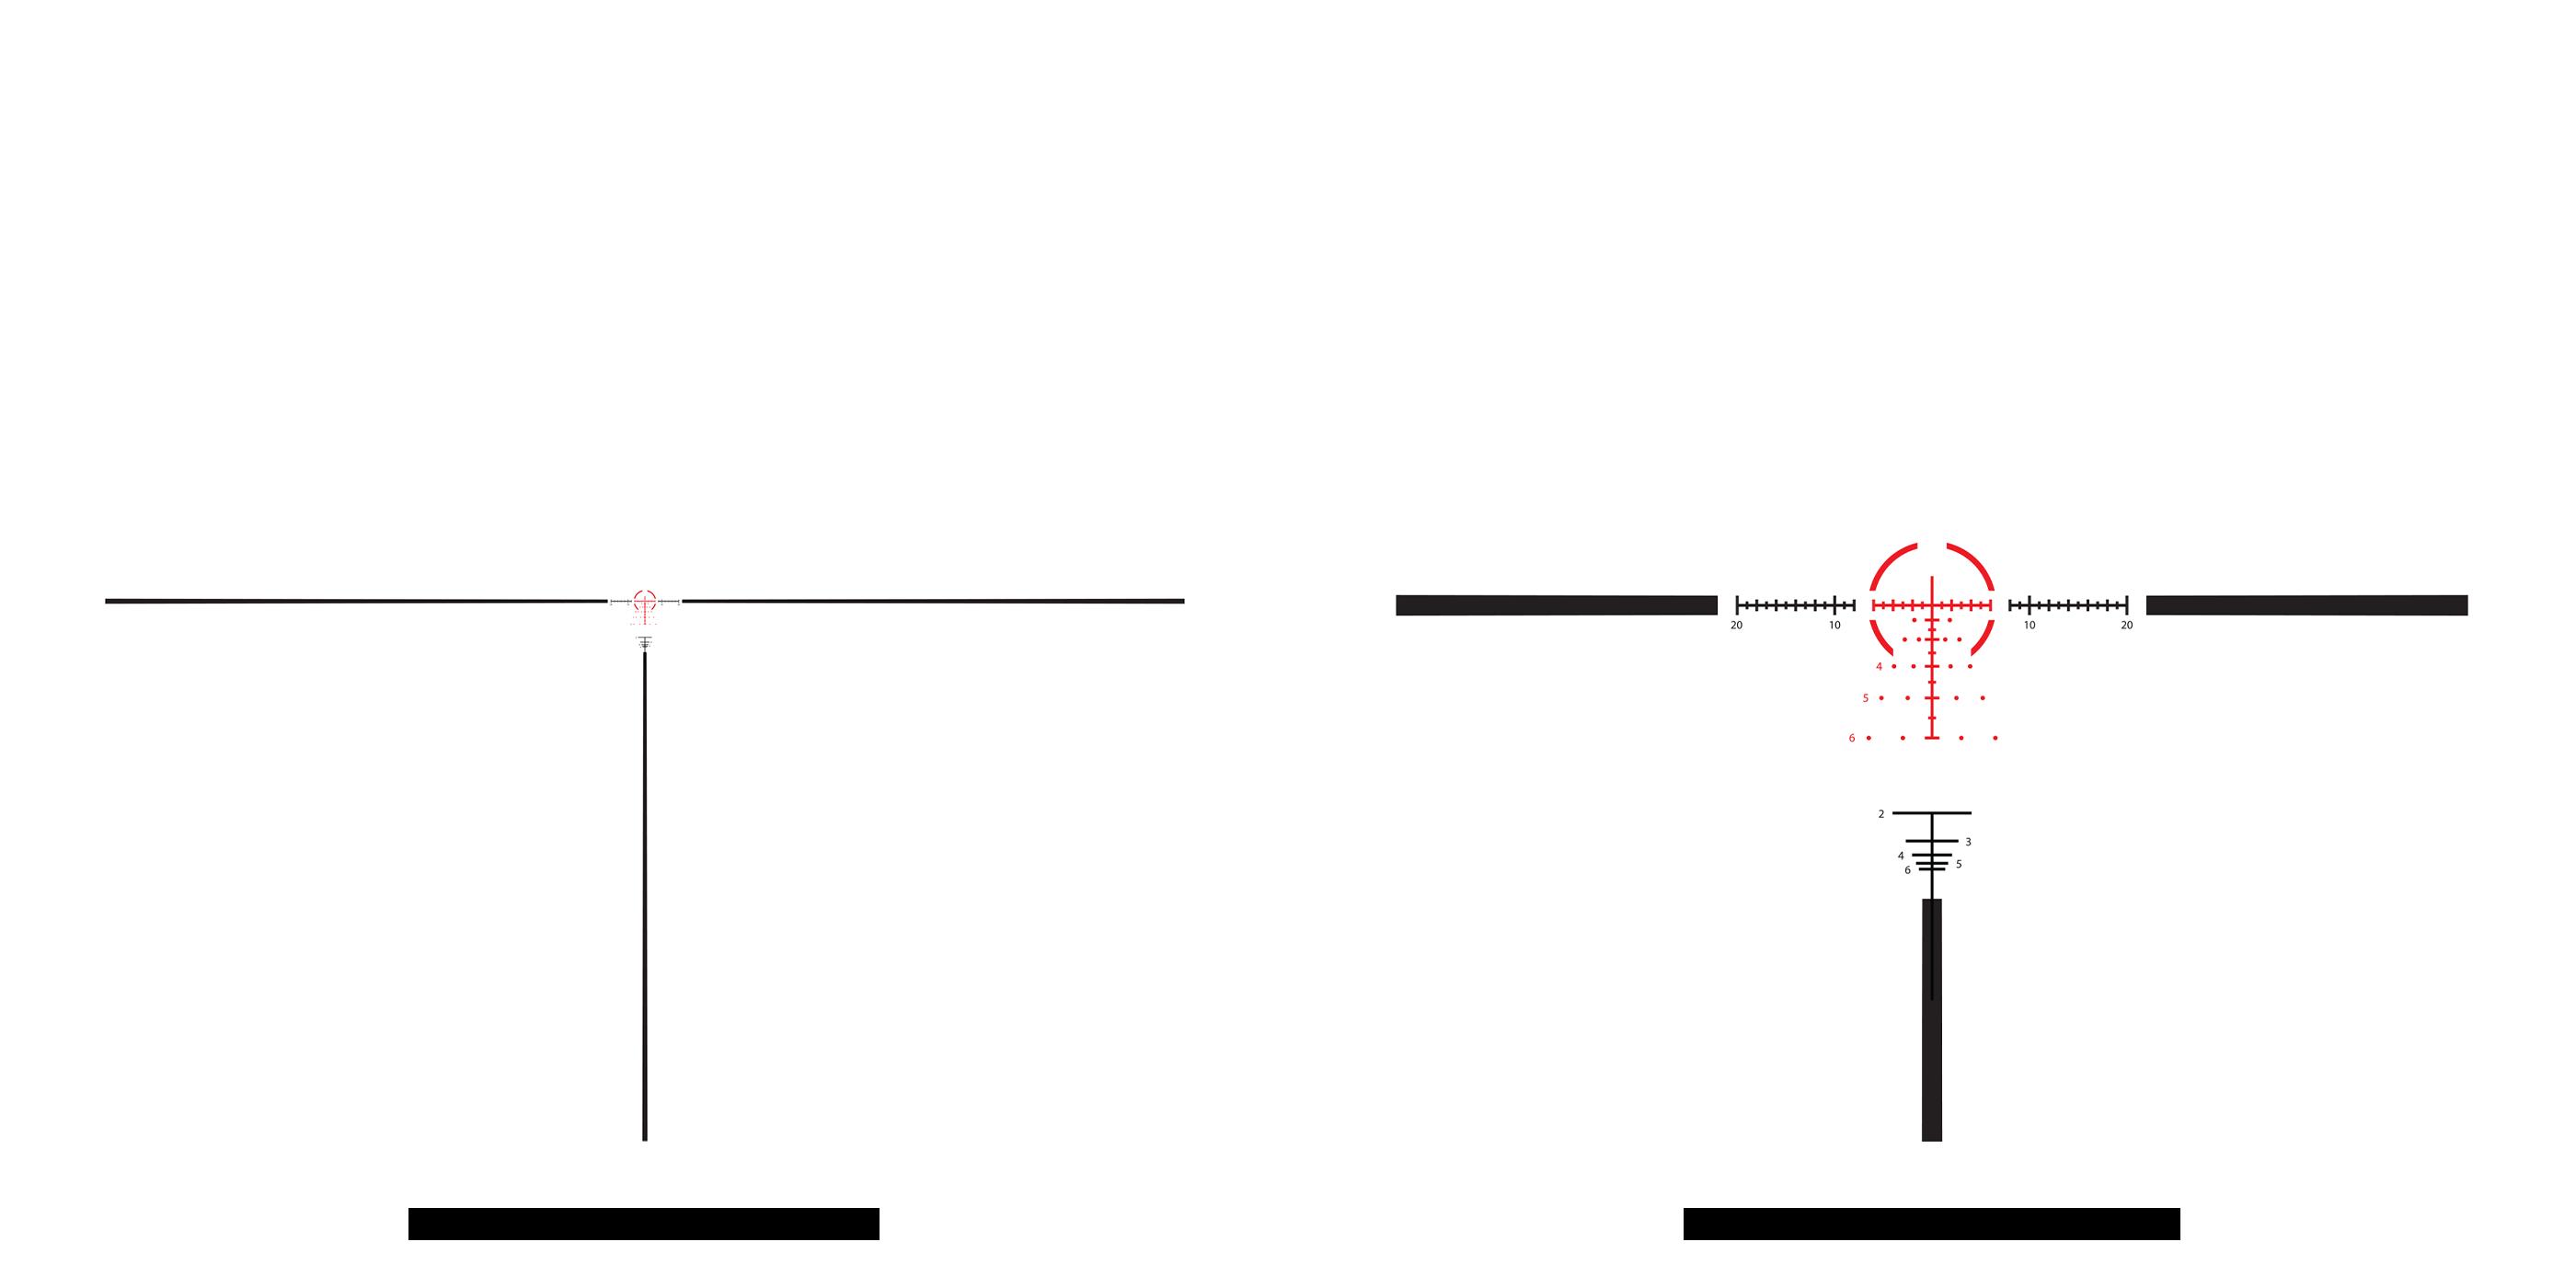 AHMR2 2x -12x Reticle